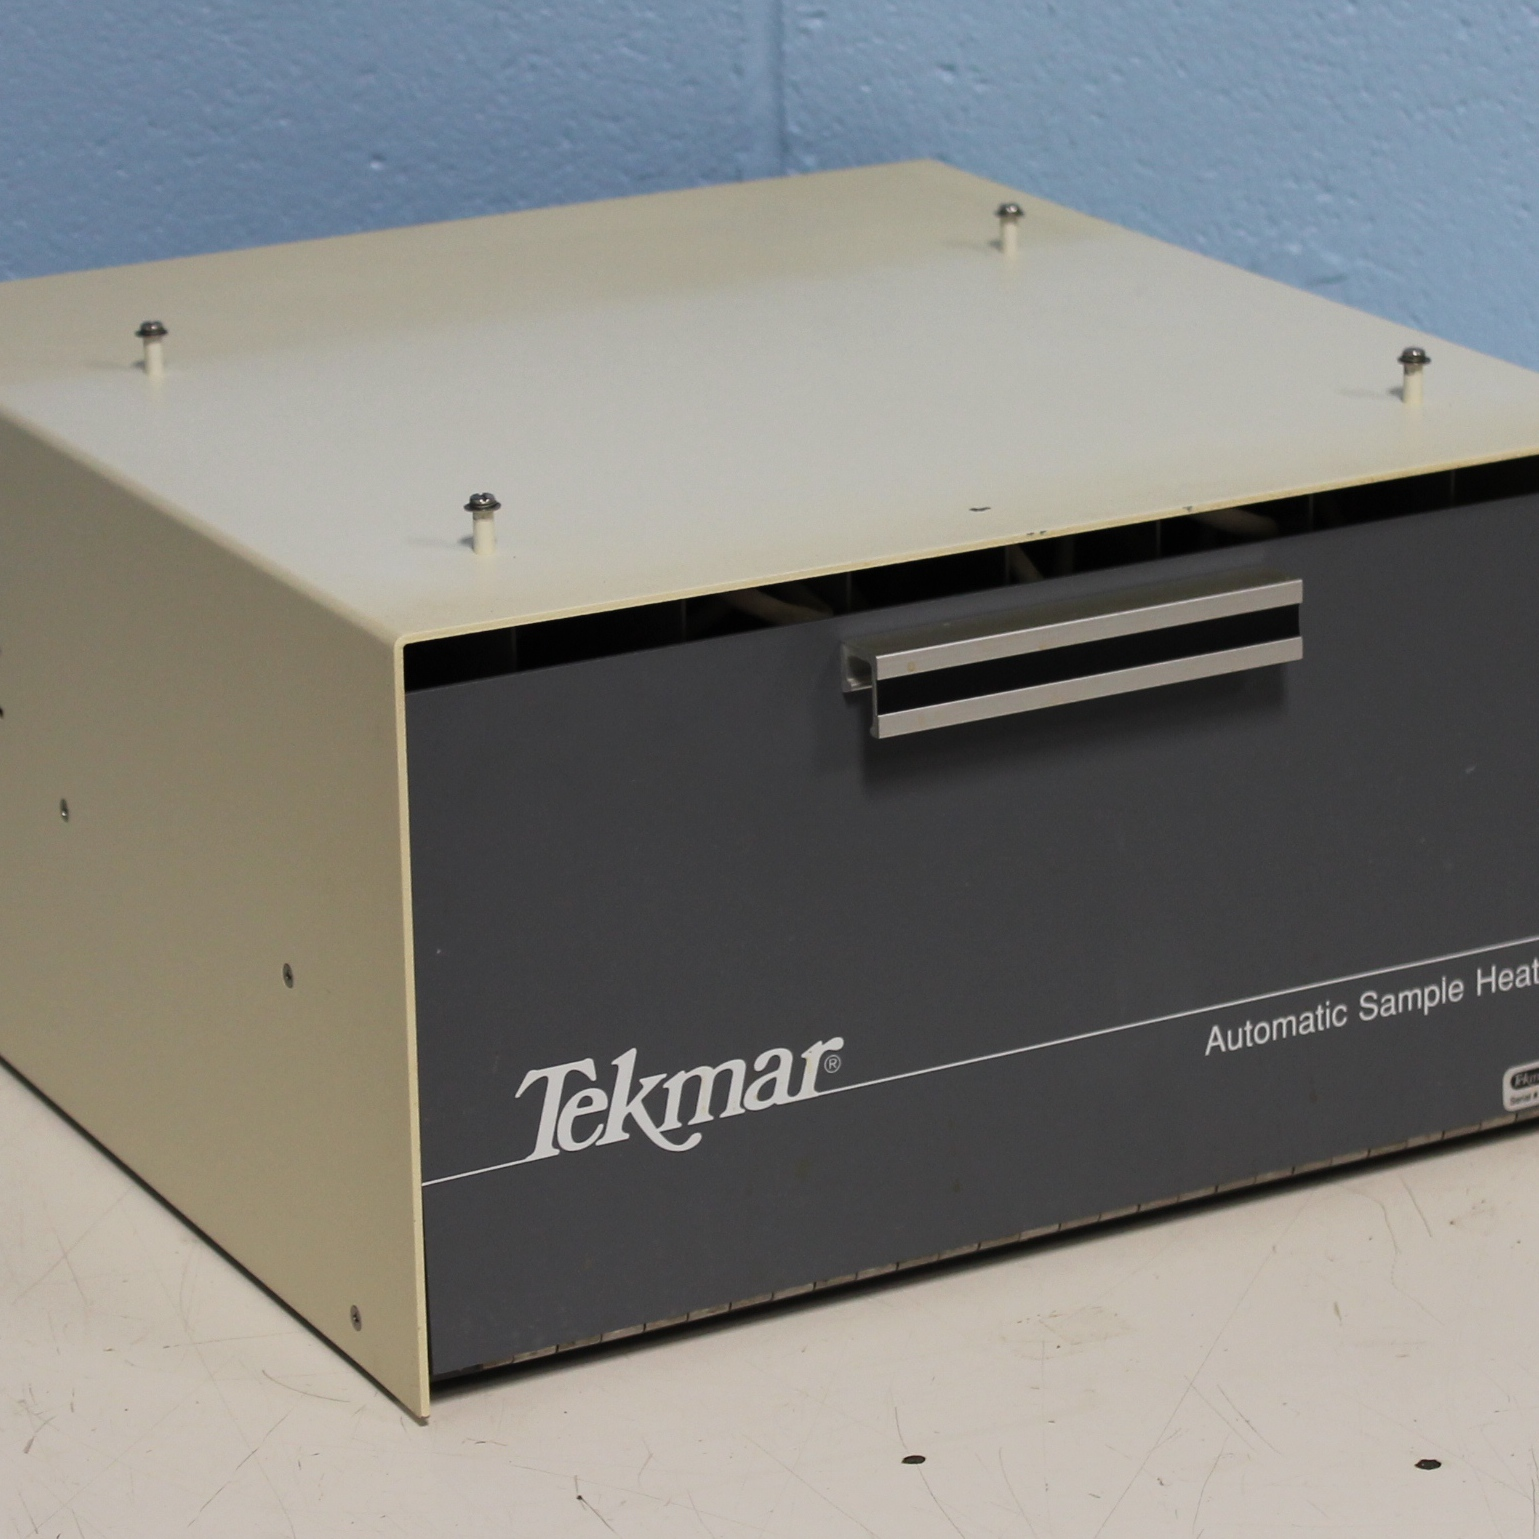 Tekmar Automatic Sample Heater Image